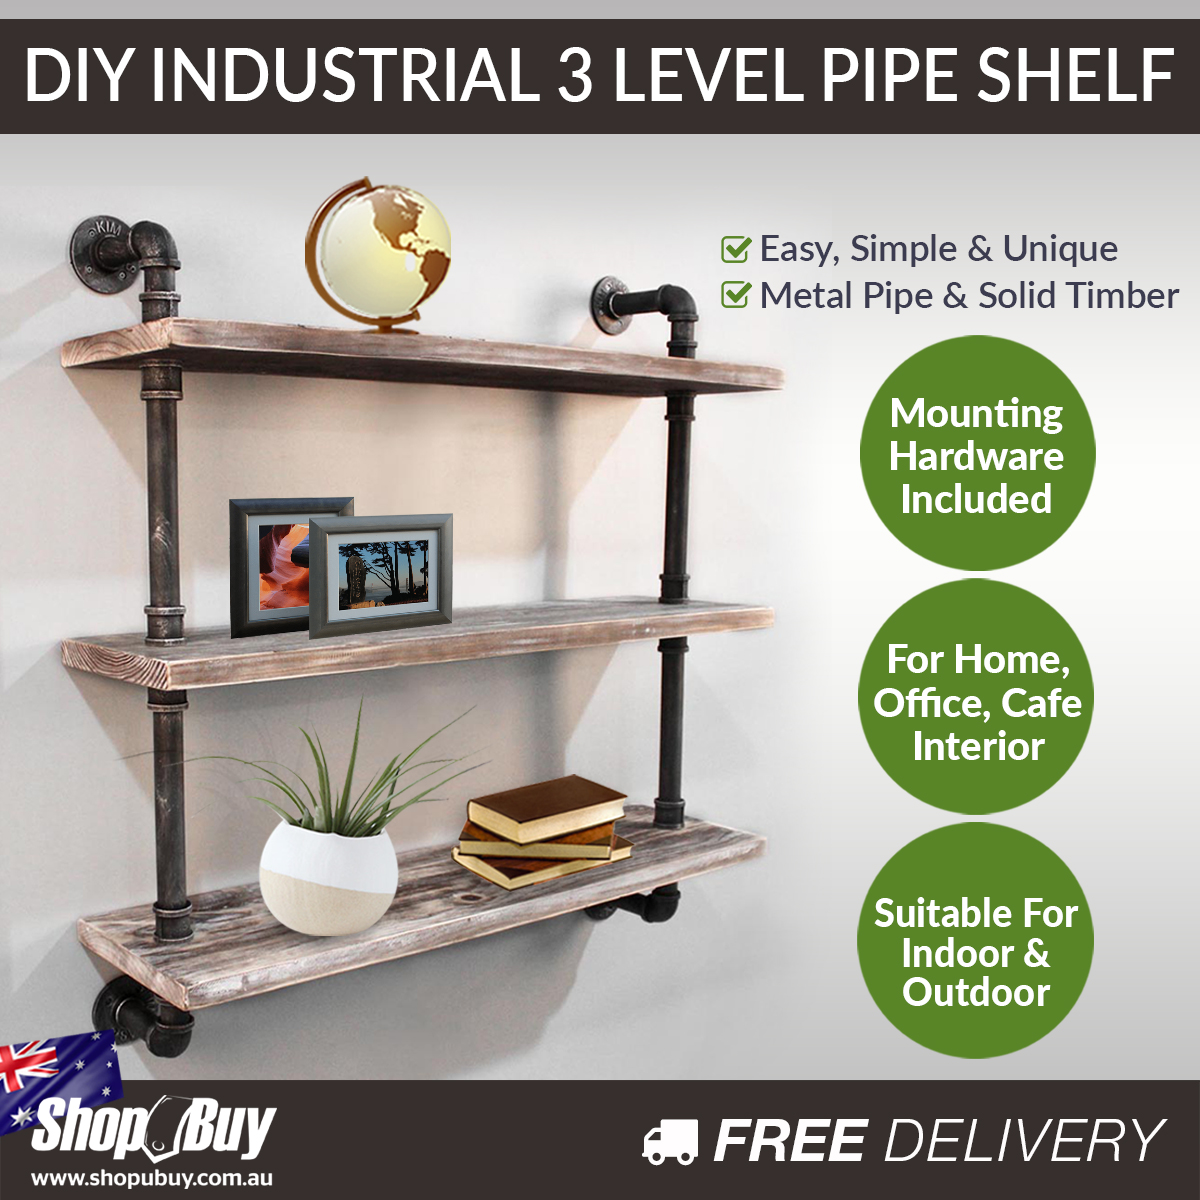 Details About Rustic Industrial Diy Floating Pipe Shelf 3 Tier Shelving Organiser